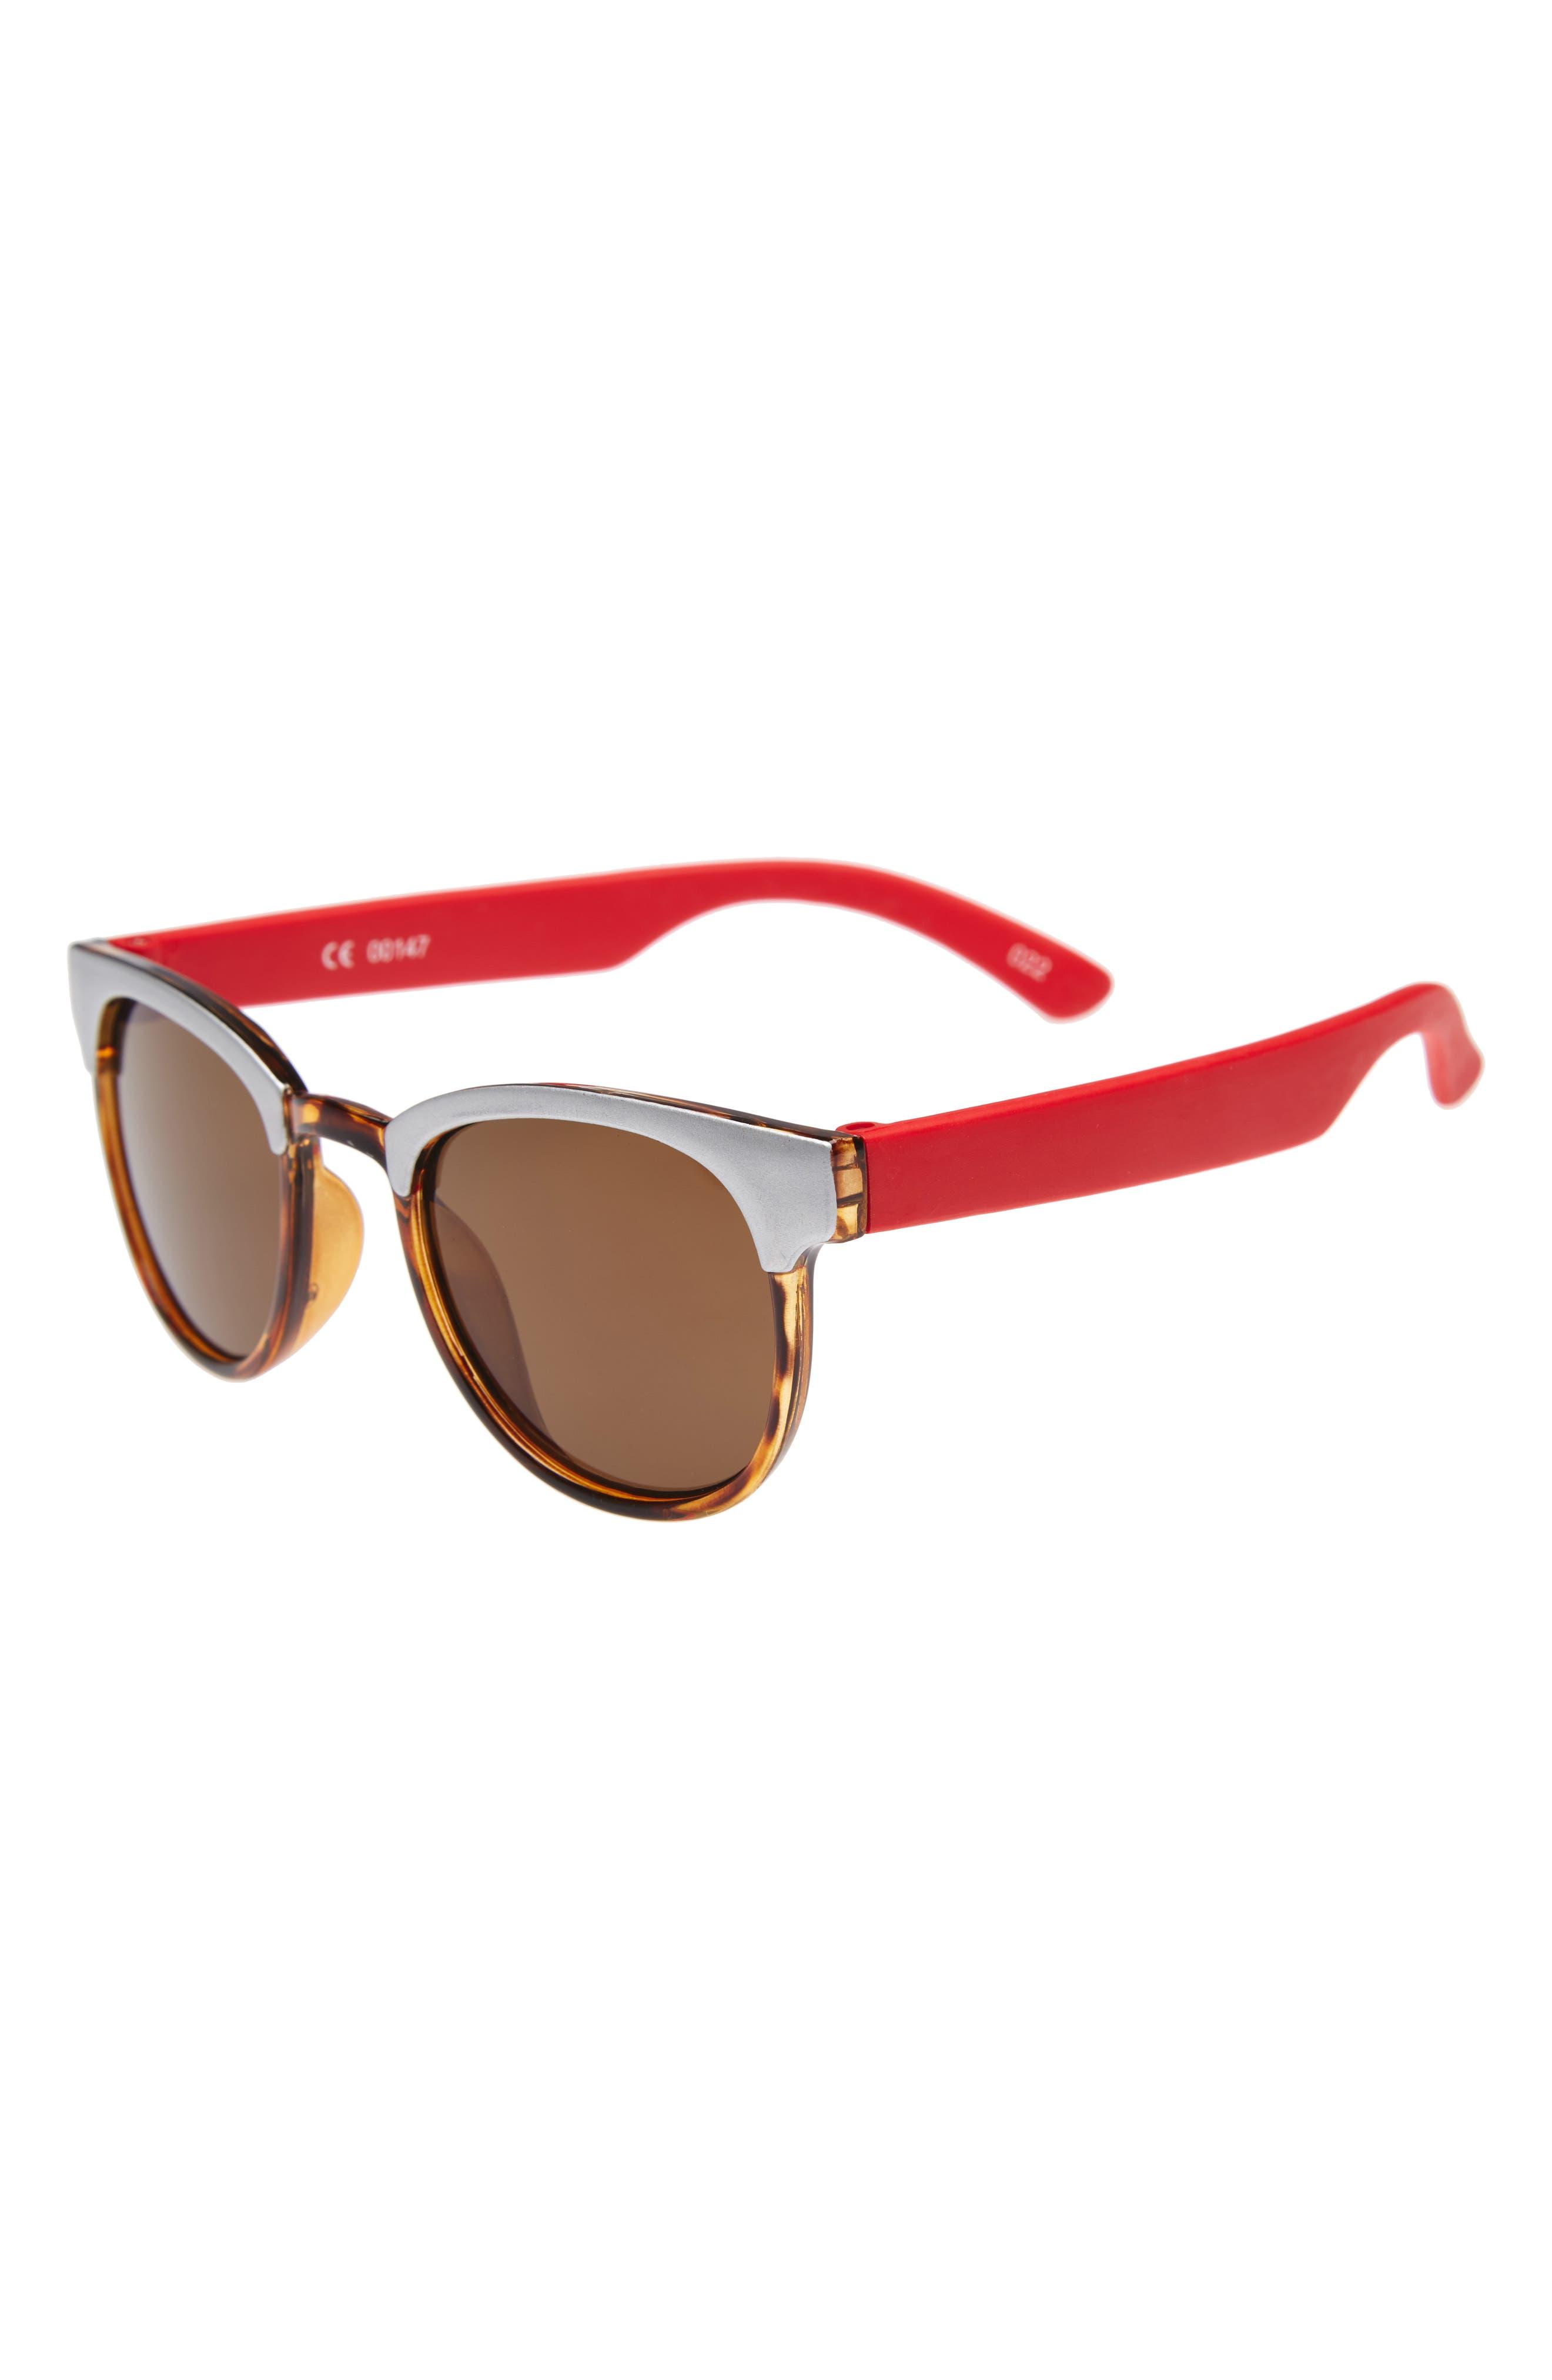 STARLIGHT ACCESSORIES Sunglasses